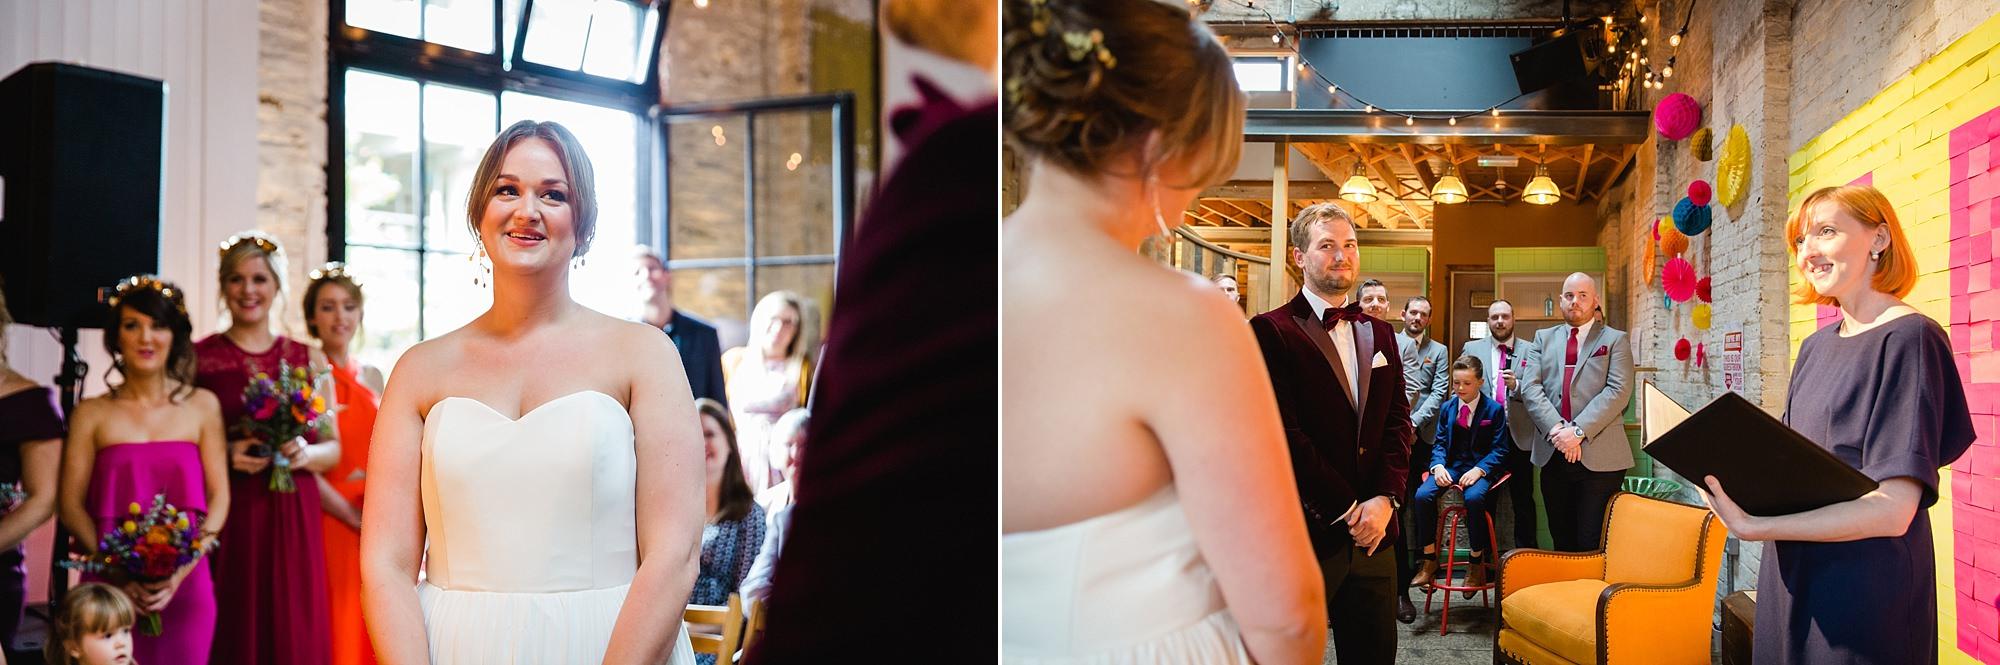 Fun London Wedding portrait of bride and groom during wedding ceremony